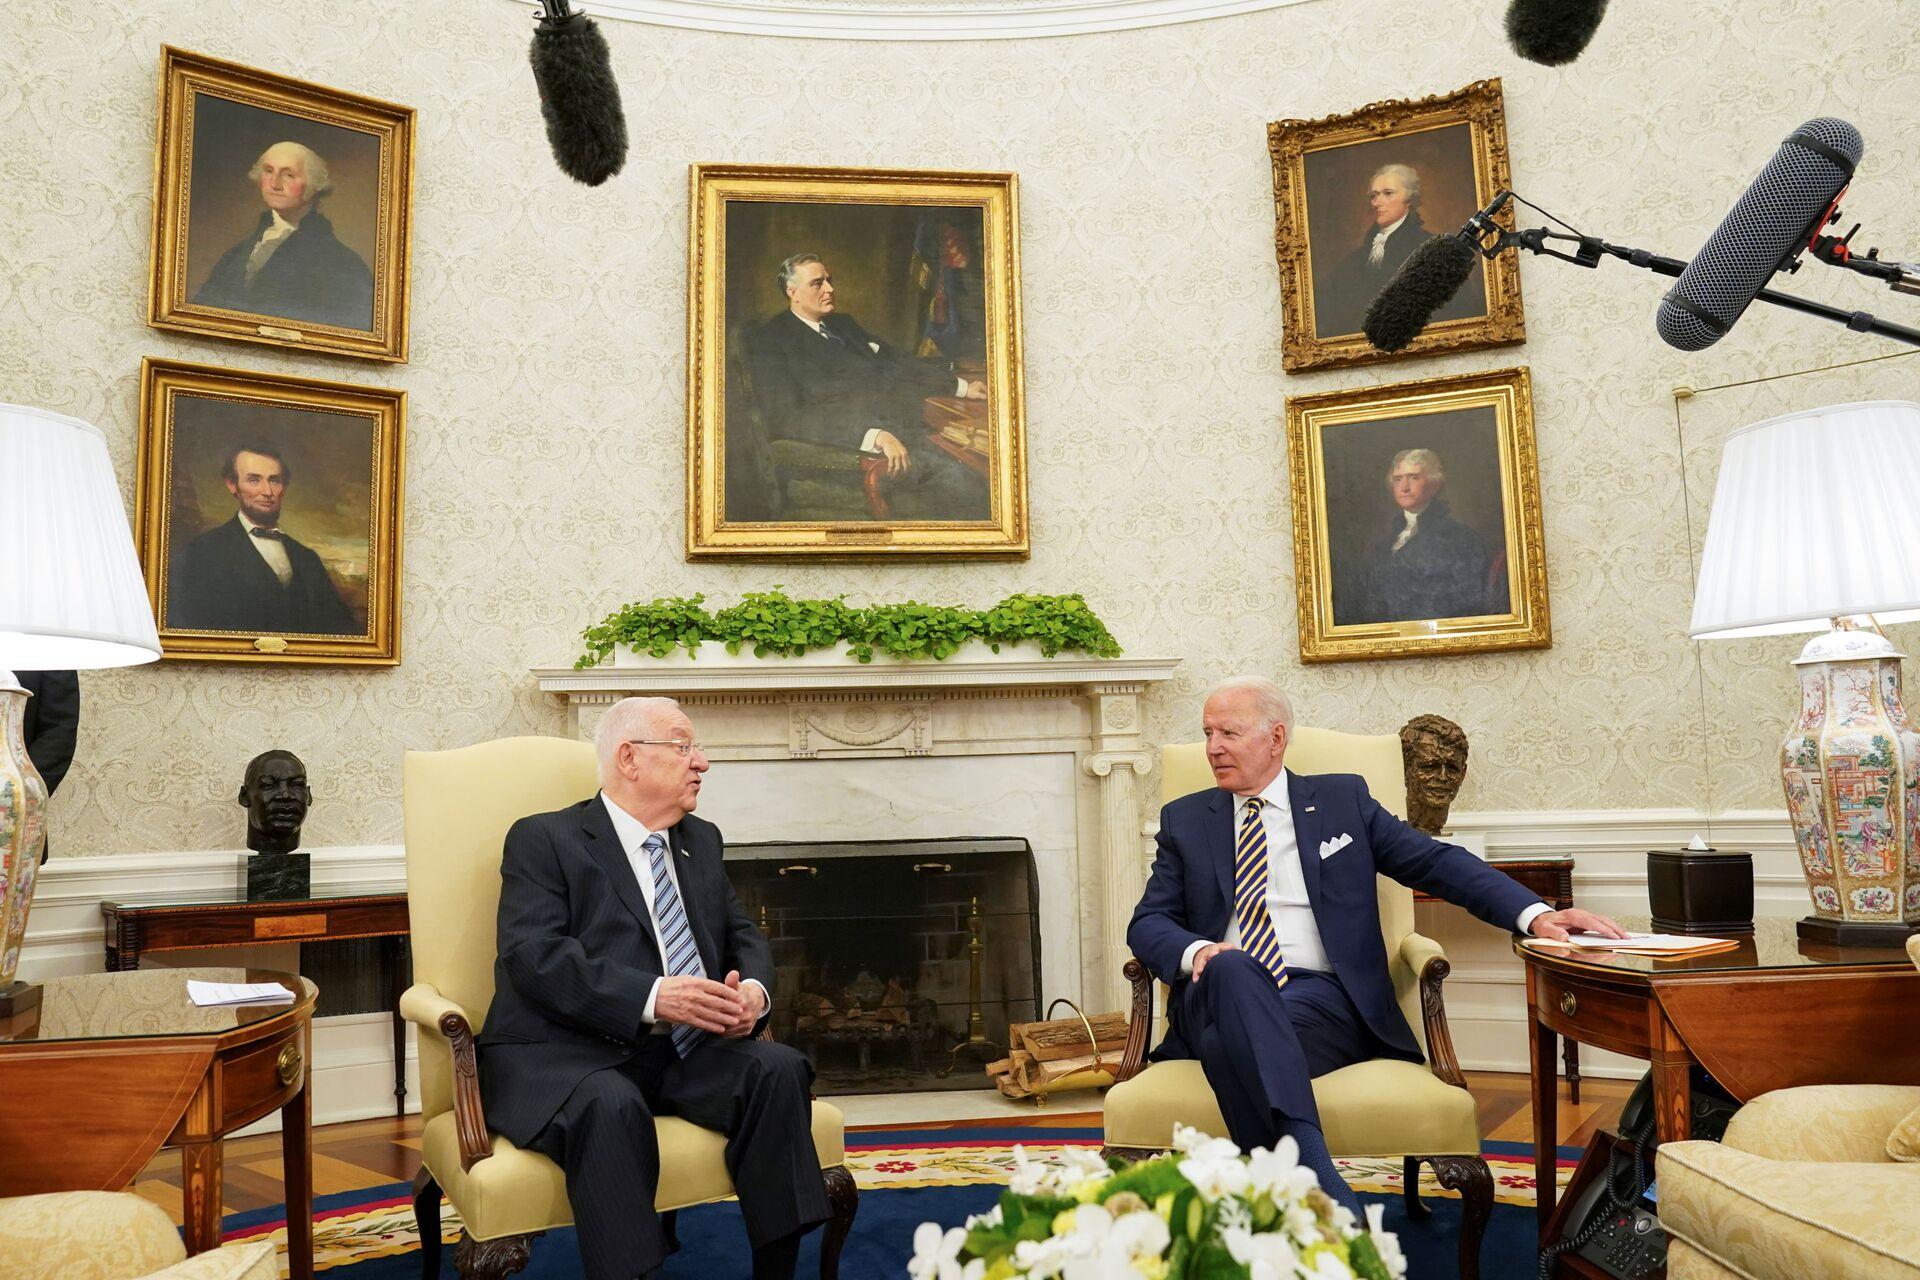 U.S. President Joe Biden meets with Israel's President Reuven Rivlin at the White House in Washington, U.S. June 28, 2021 - Sputnik International, 1920, 07.09.2021